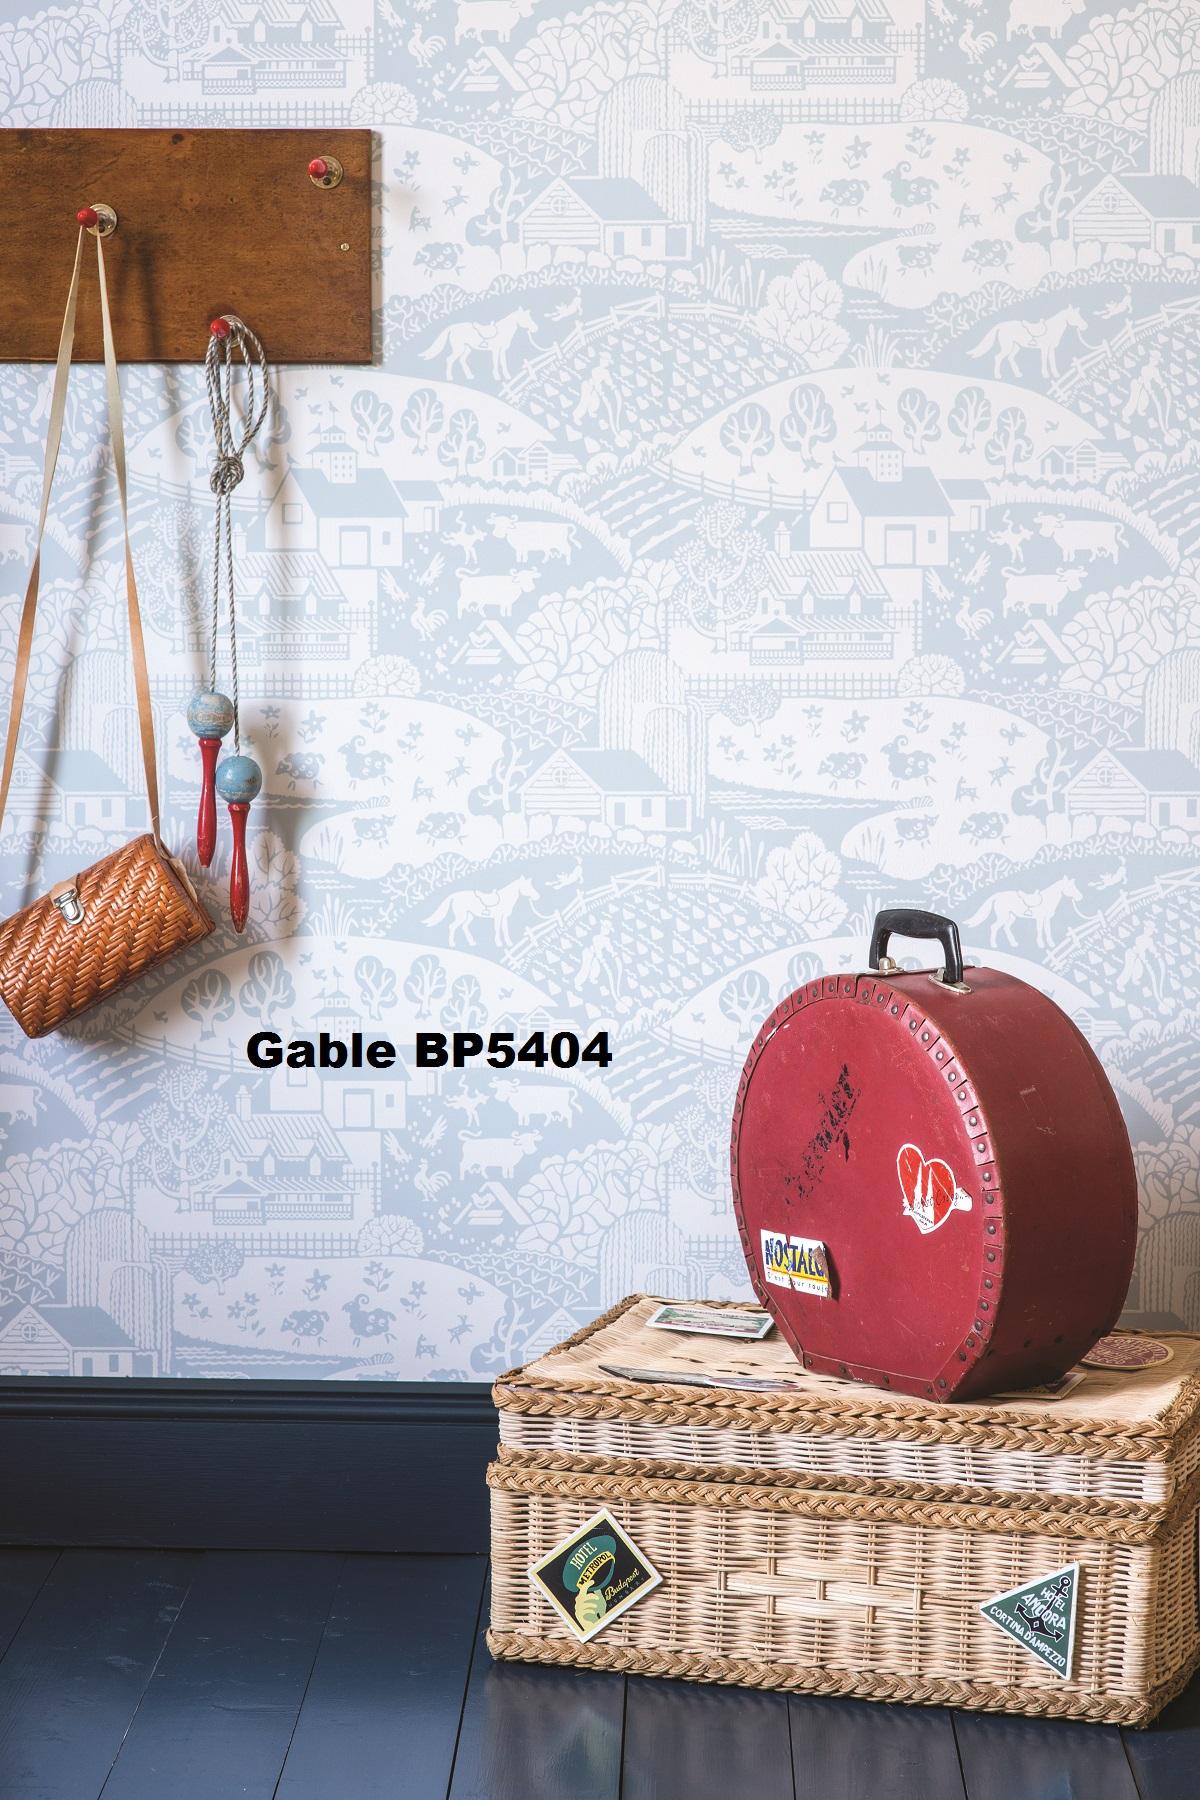 Gable BP5404 small